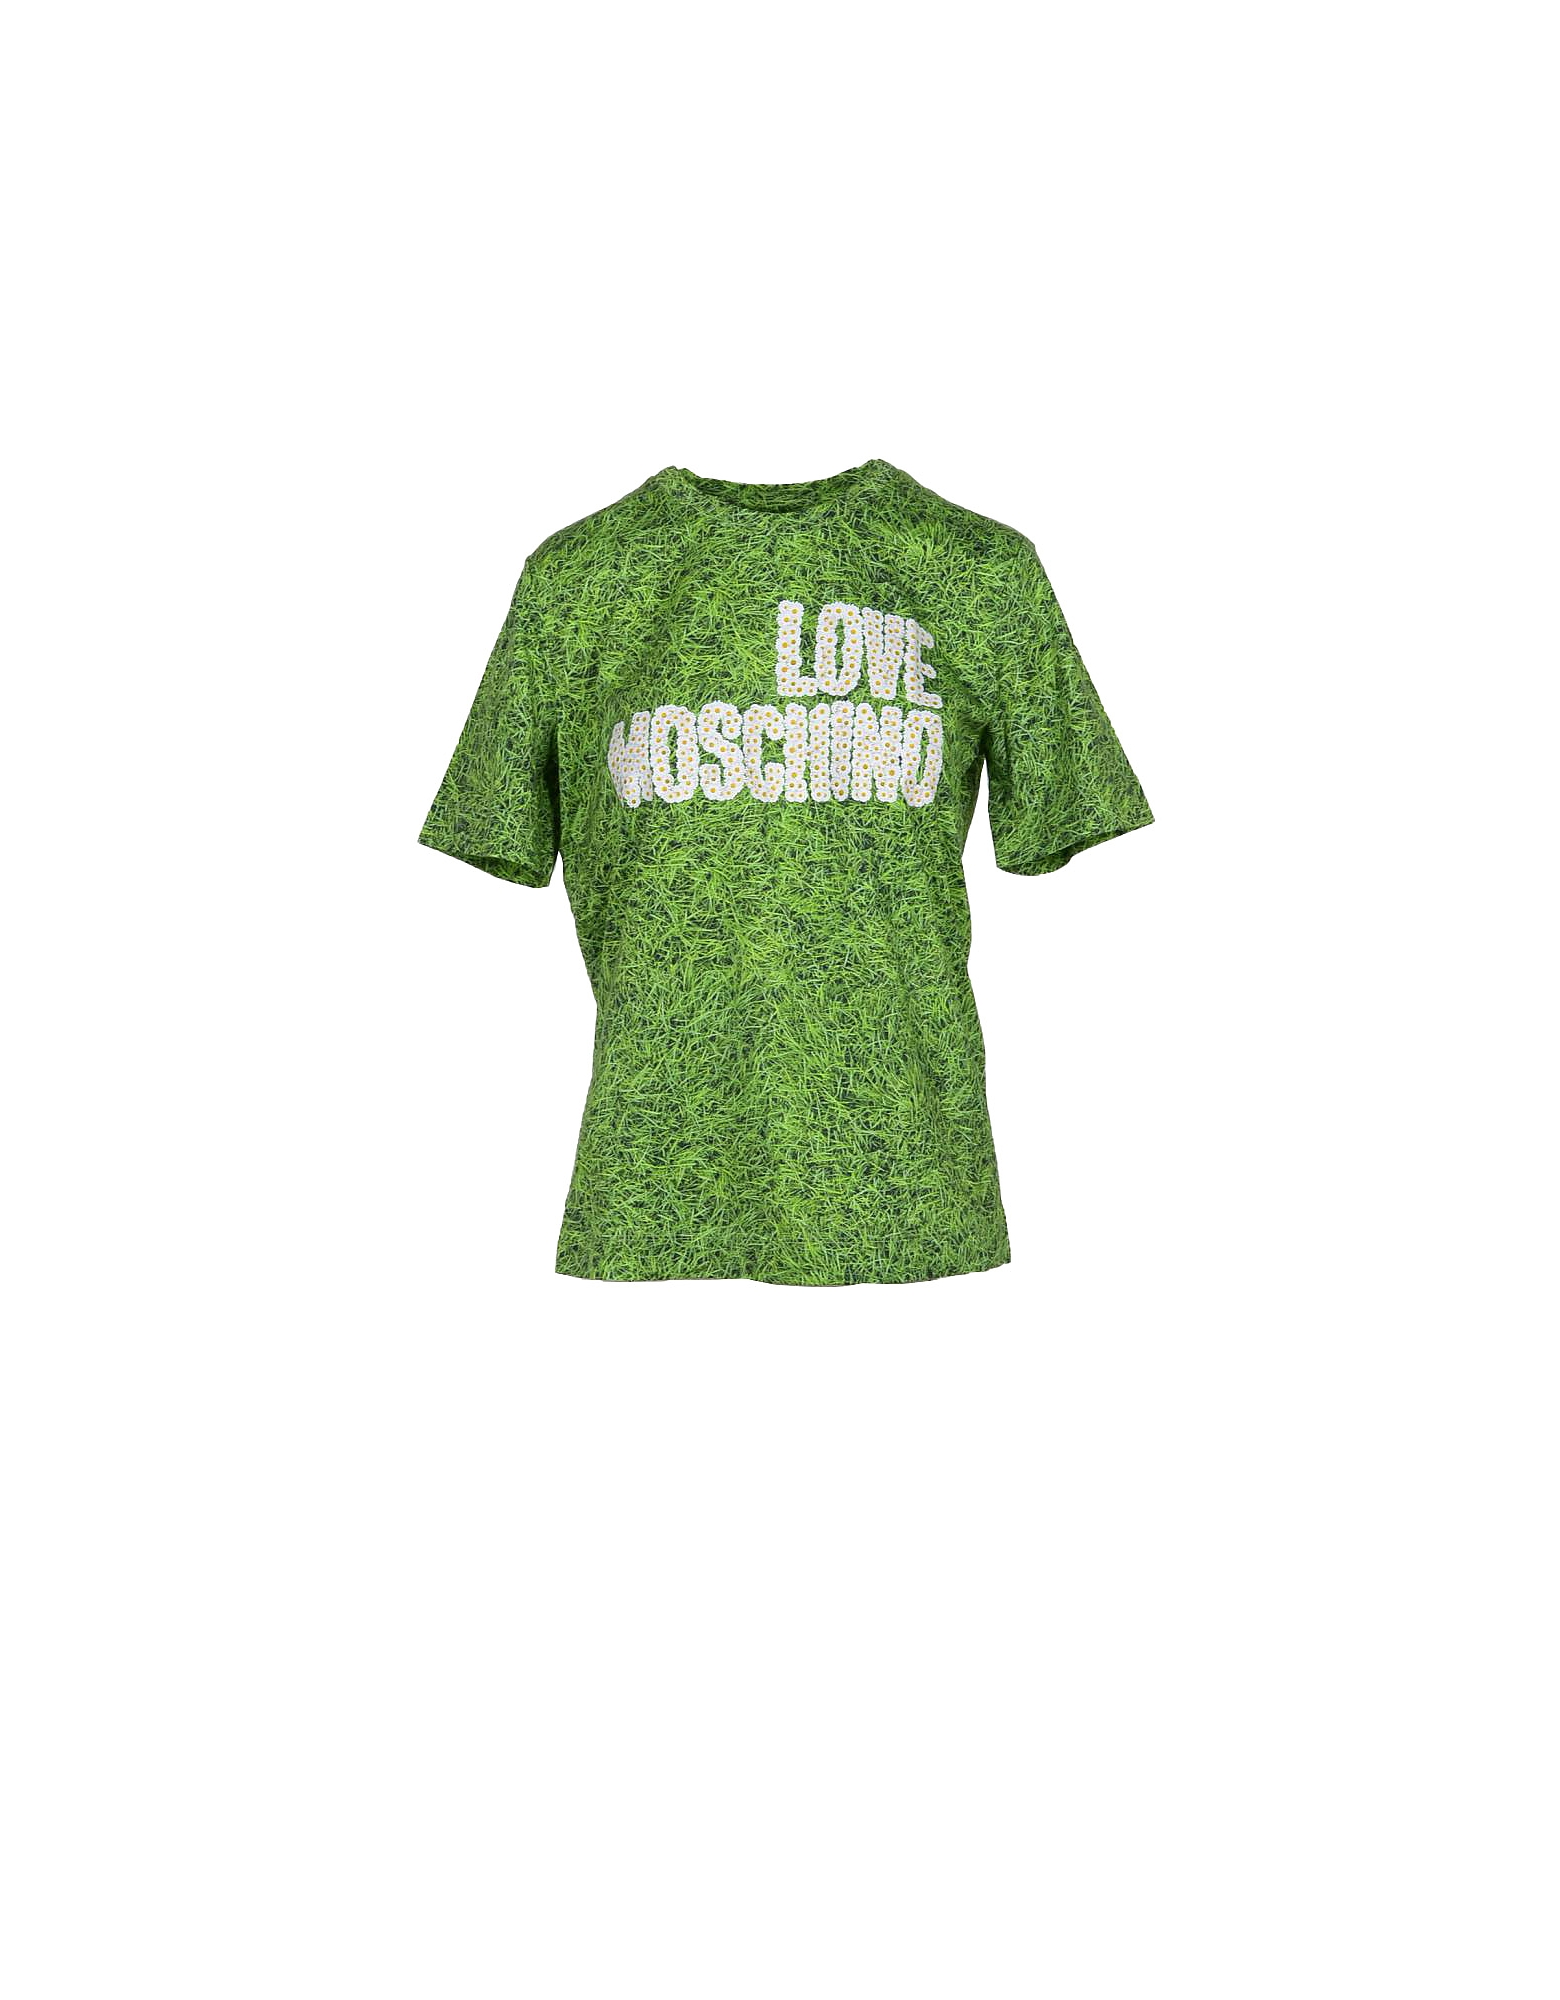 Love Moschino Designer T-Shirts & Tops, Grass Green Printed Cotton Women's T-Shirt w/Daisy Signature